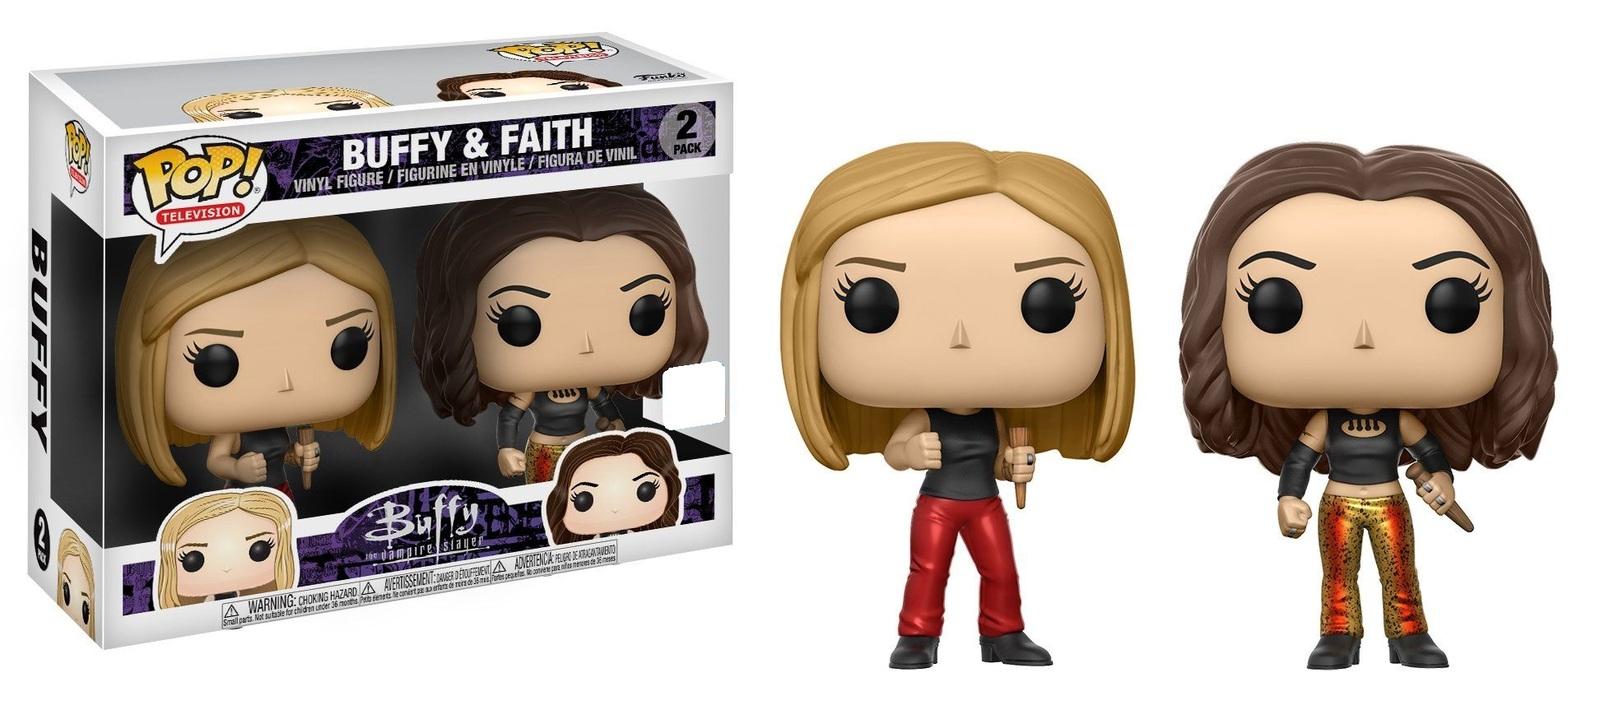 Buffy & Faith - Pop! Vinyl 2-Pack (LIMIT - ONE PER CUSTOMER) image